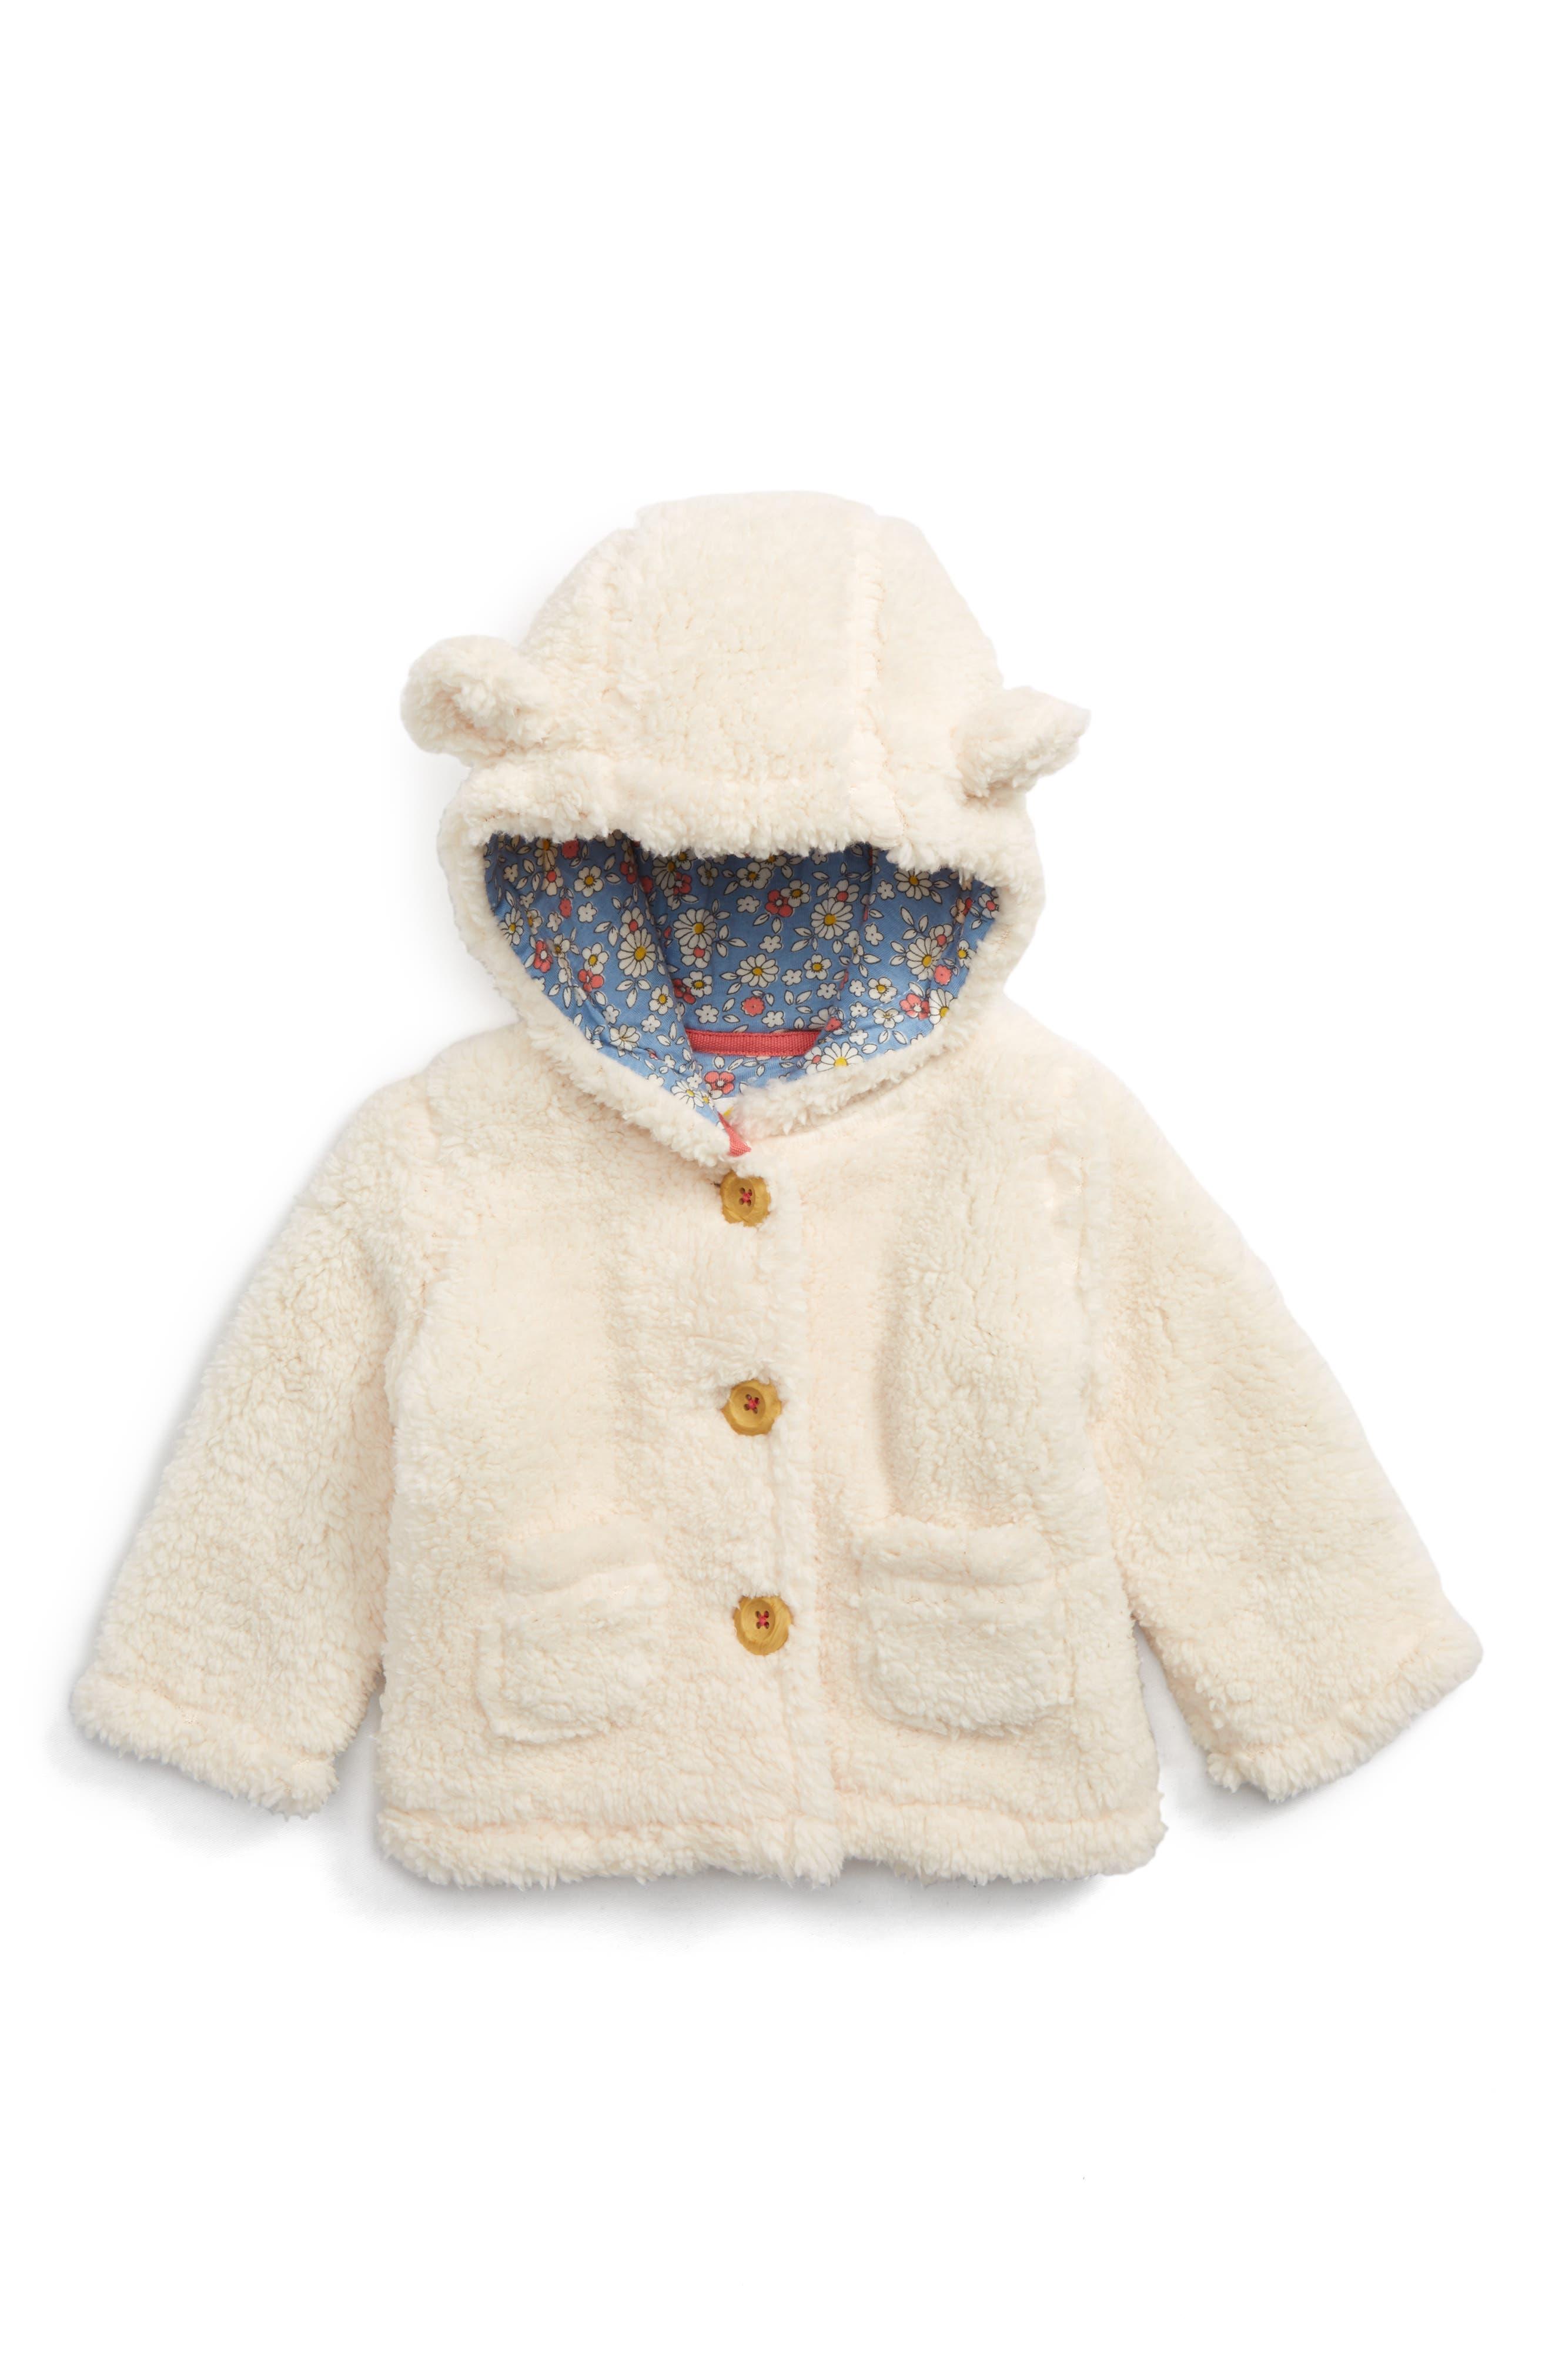 MINI BODEN Teddy Bear Hooded Jacket, Main, color, 900